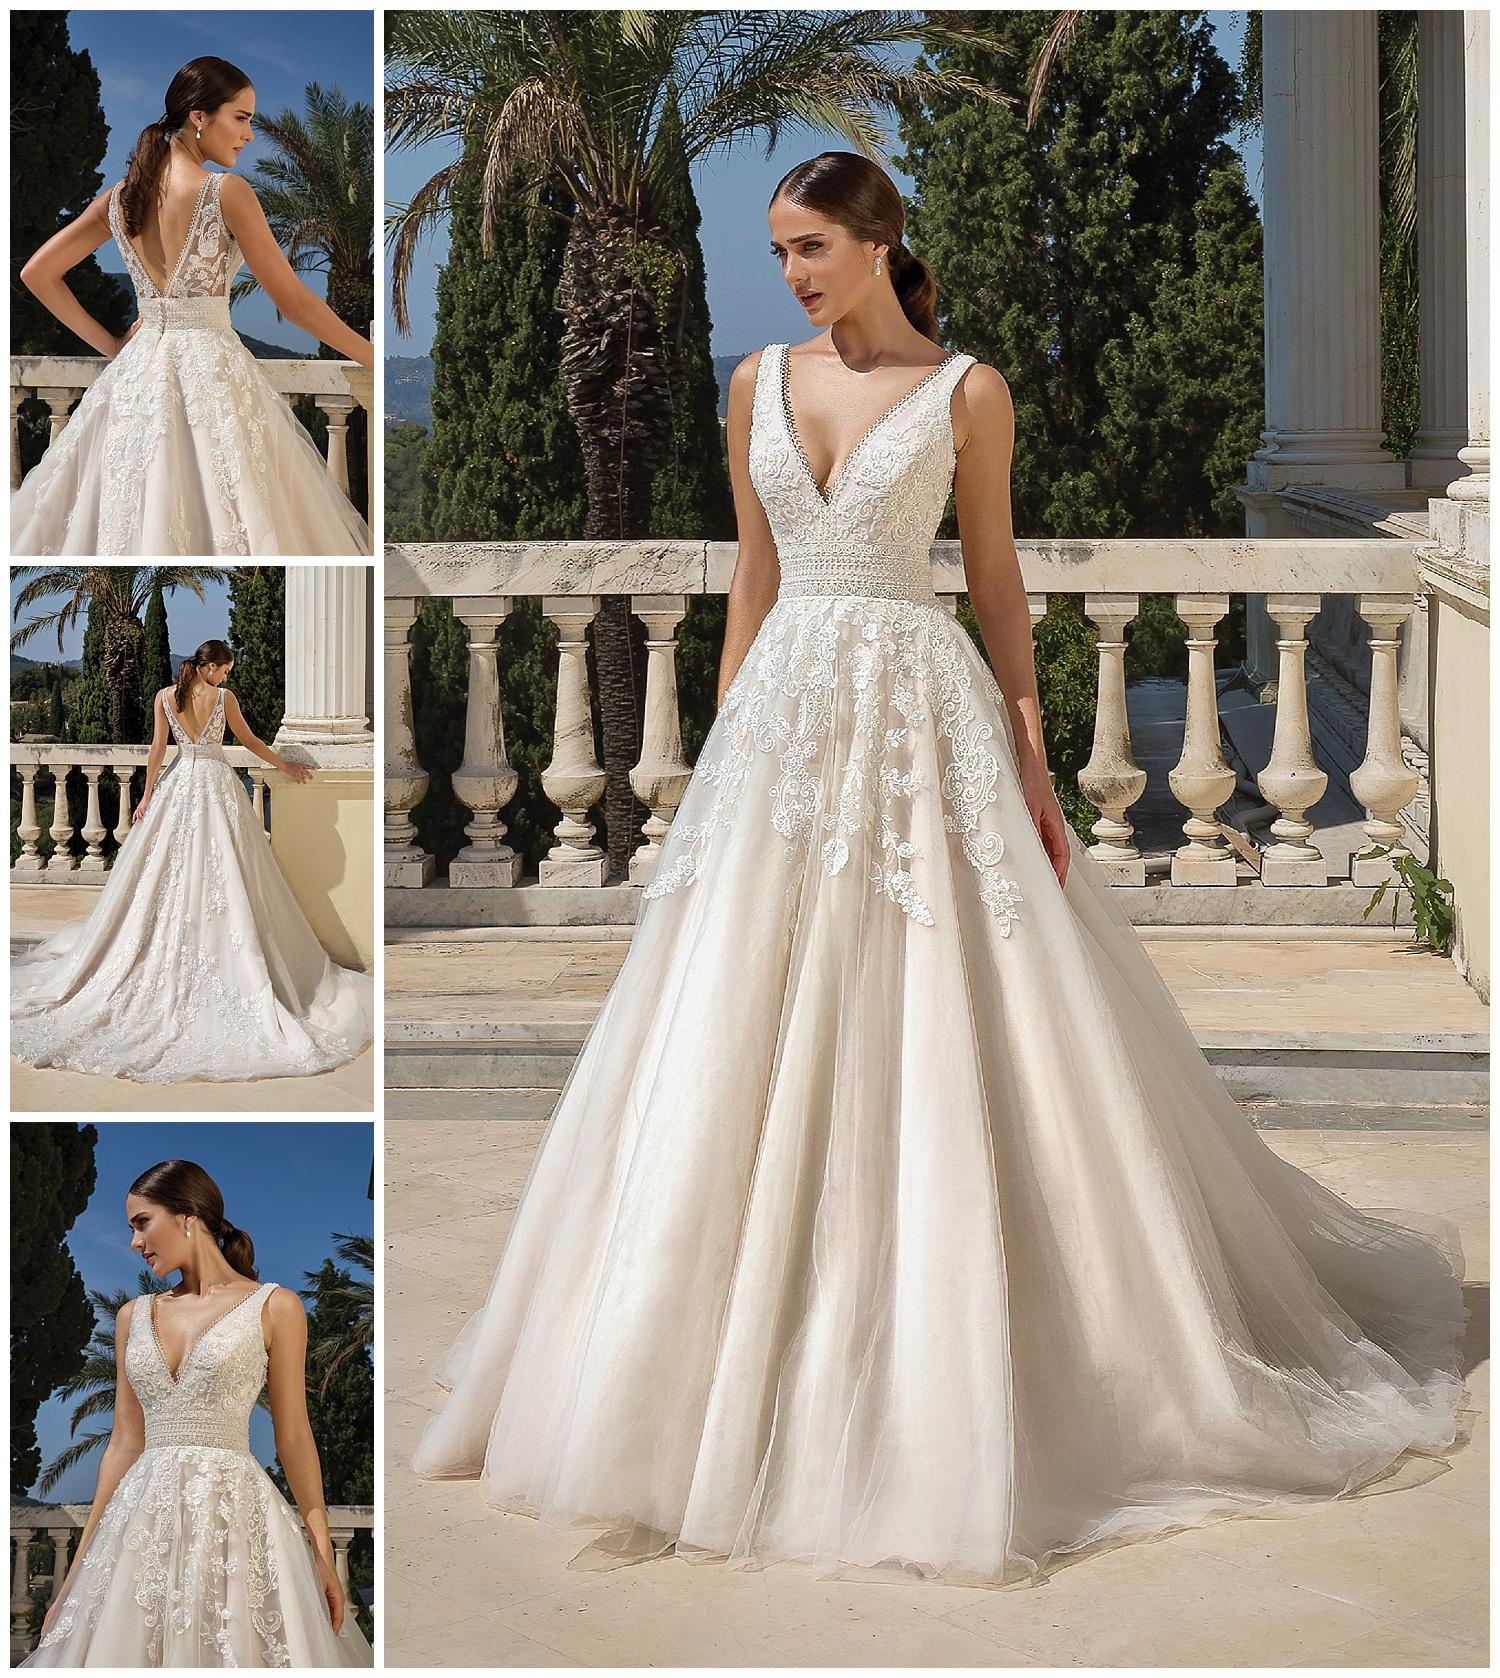 justin-alexander-88100-ballgown-dress-epiphany-boutique-carmel-california.jpg